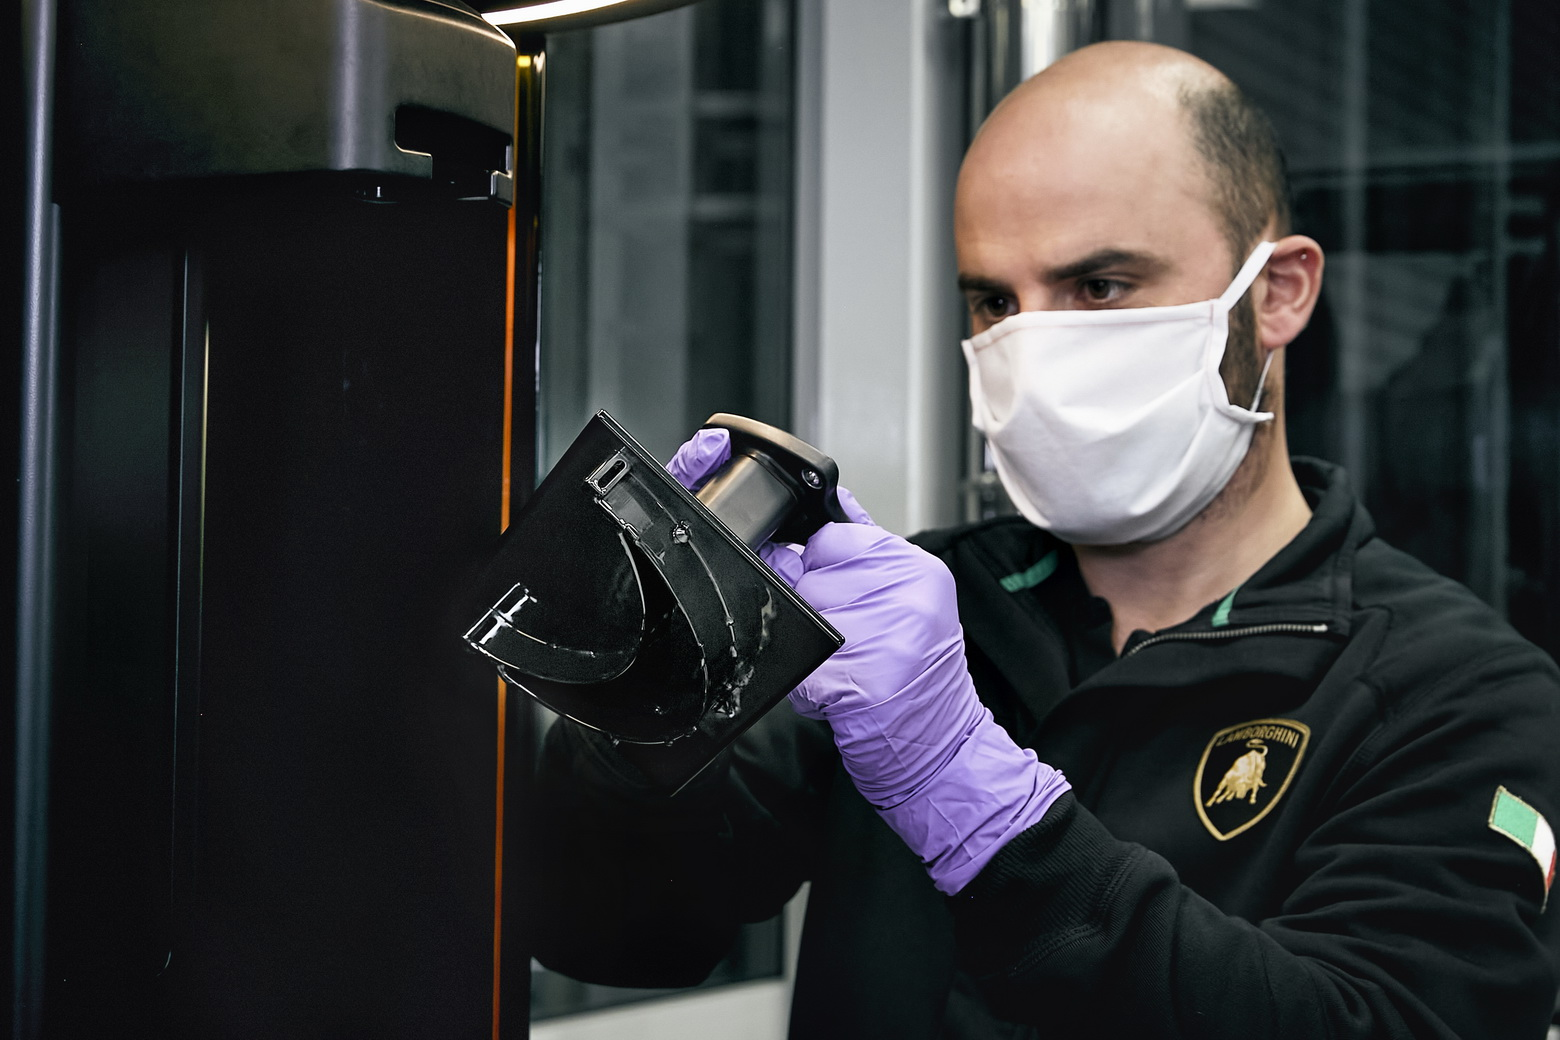 Lamborghini – produkcja maseczek w Sant'Agata Bolognese